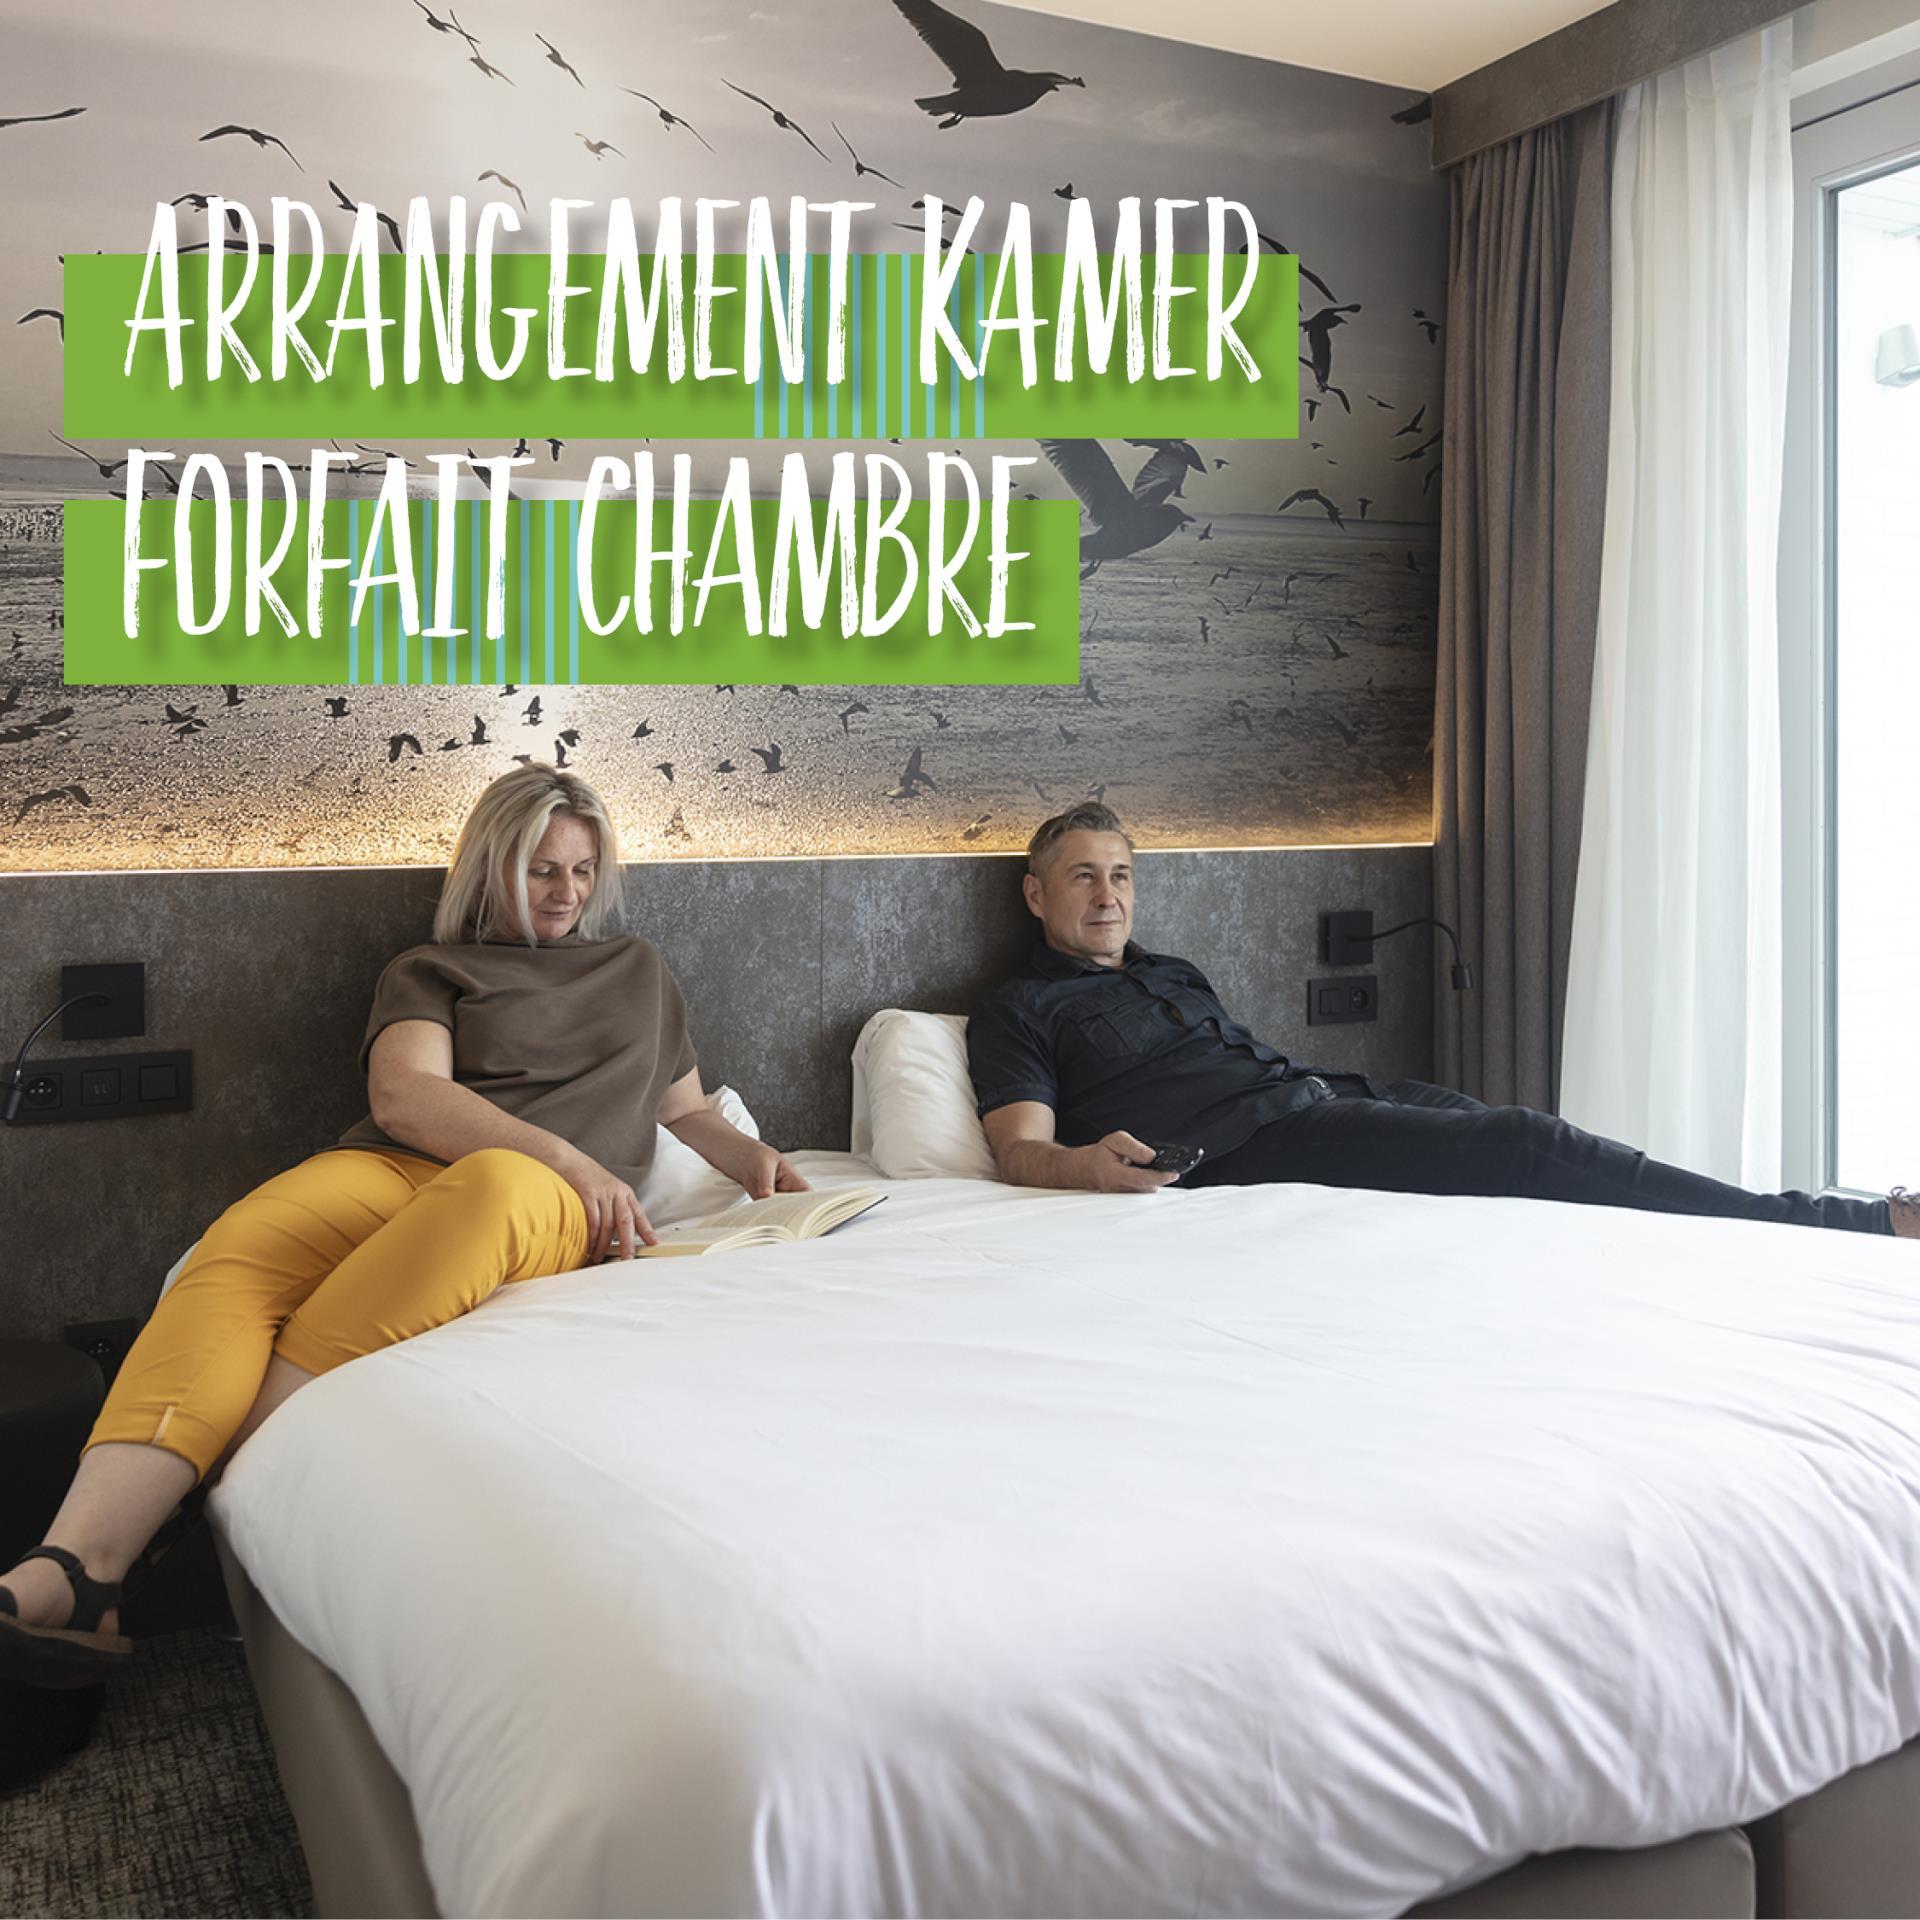 Arrangement kamer